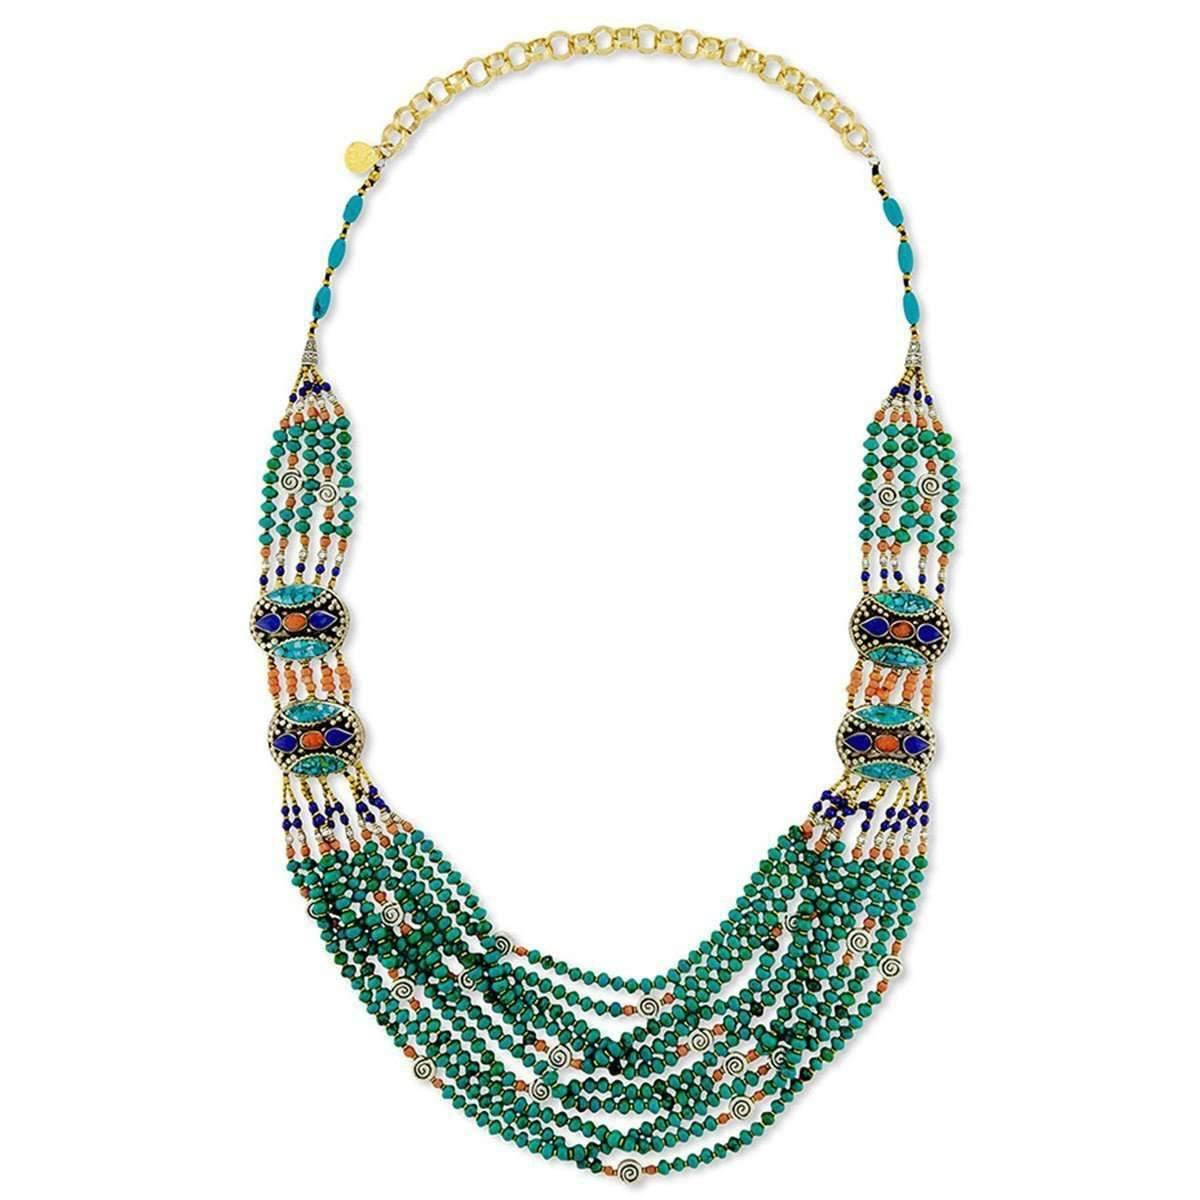 Devon Leigh Multi-Strand Green Turquoise Beaded Necklace OSv99TM2